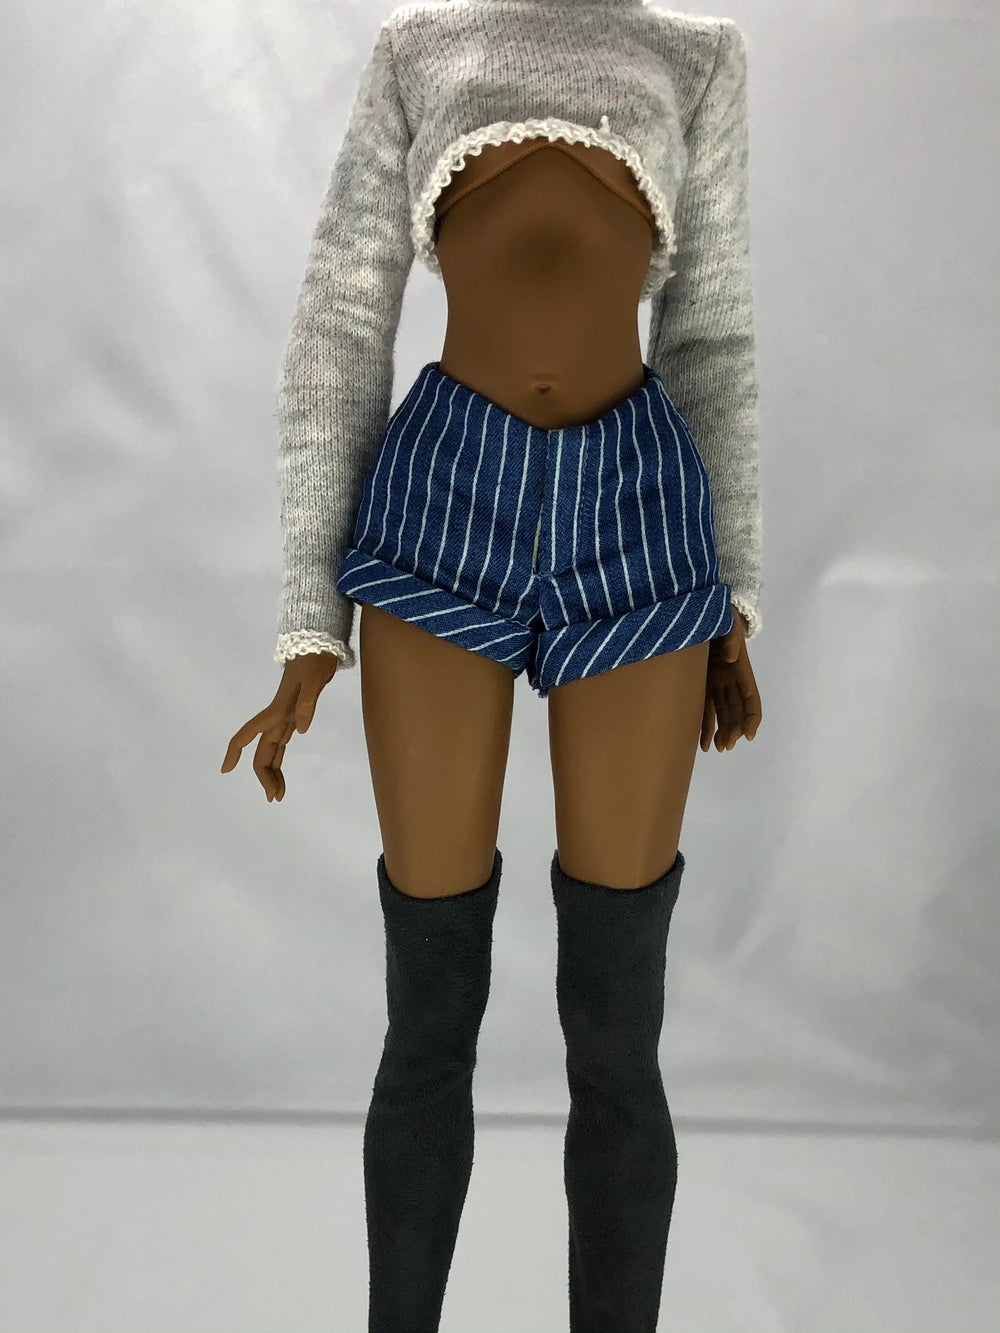 Pinstripe Cuff Shorts: Pidgin Doll